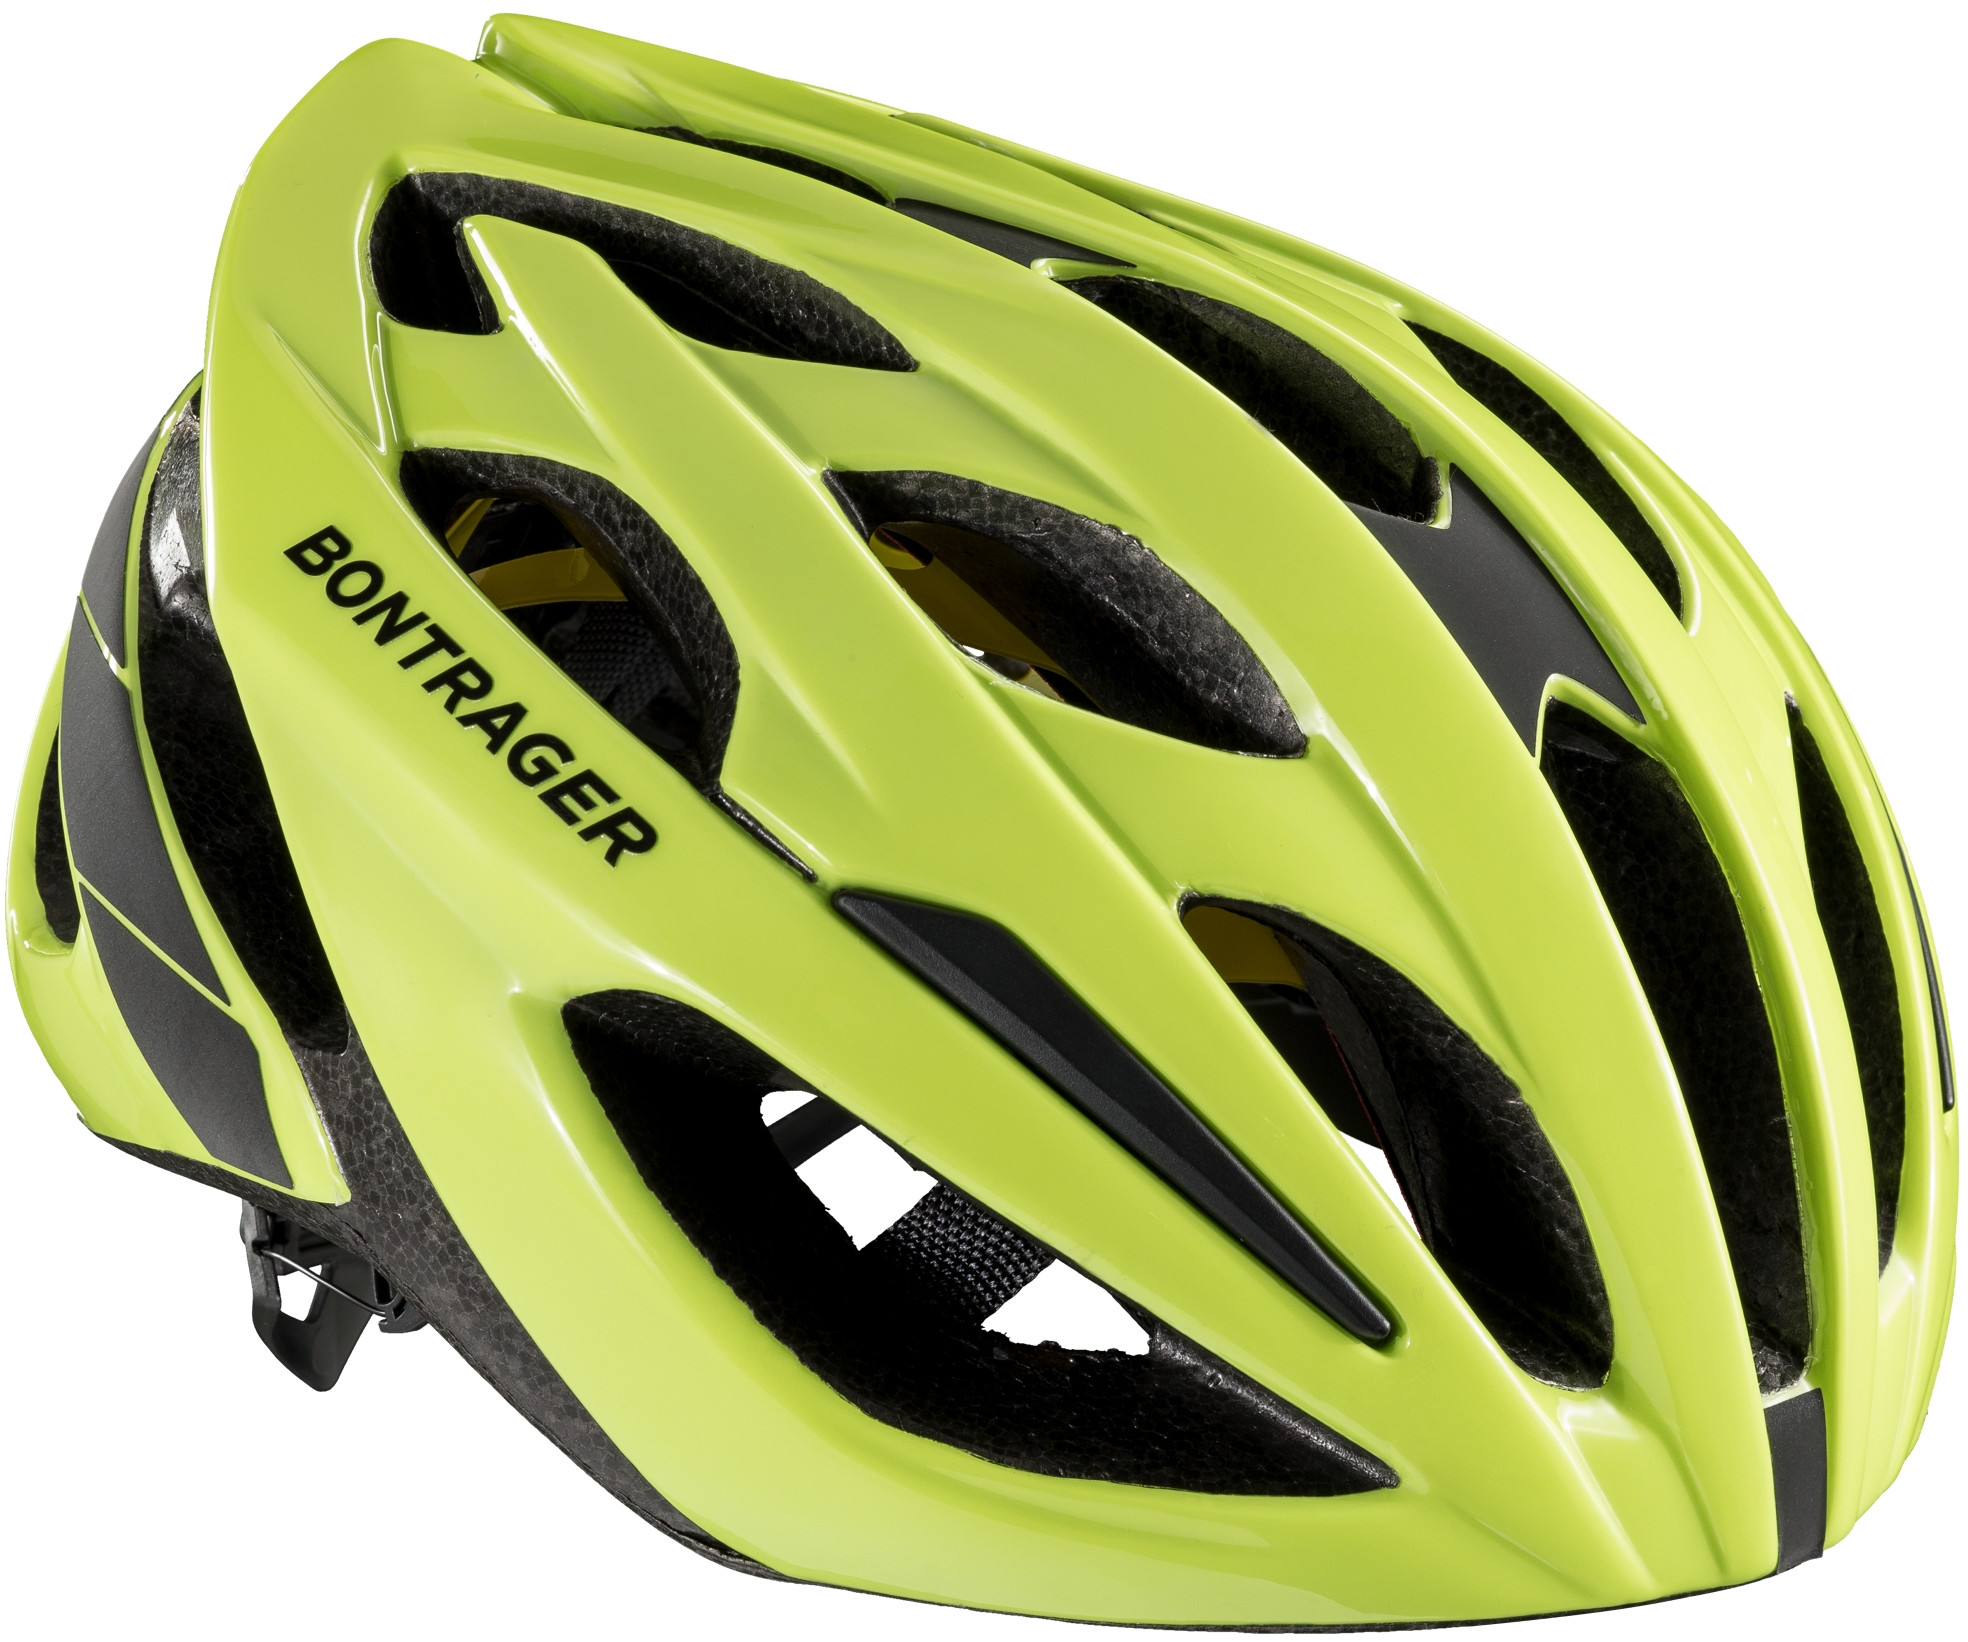 Bontrager Starvos Mips Road Bike Helmet Adult Helmets